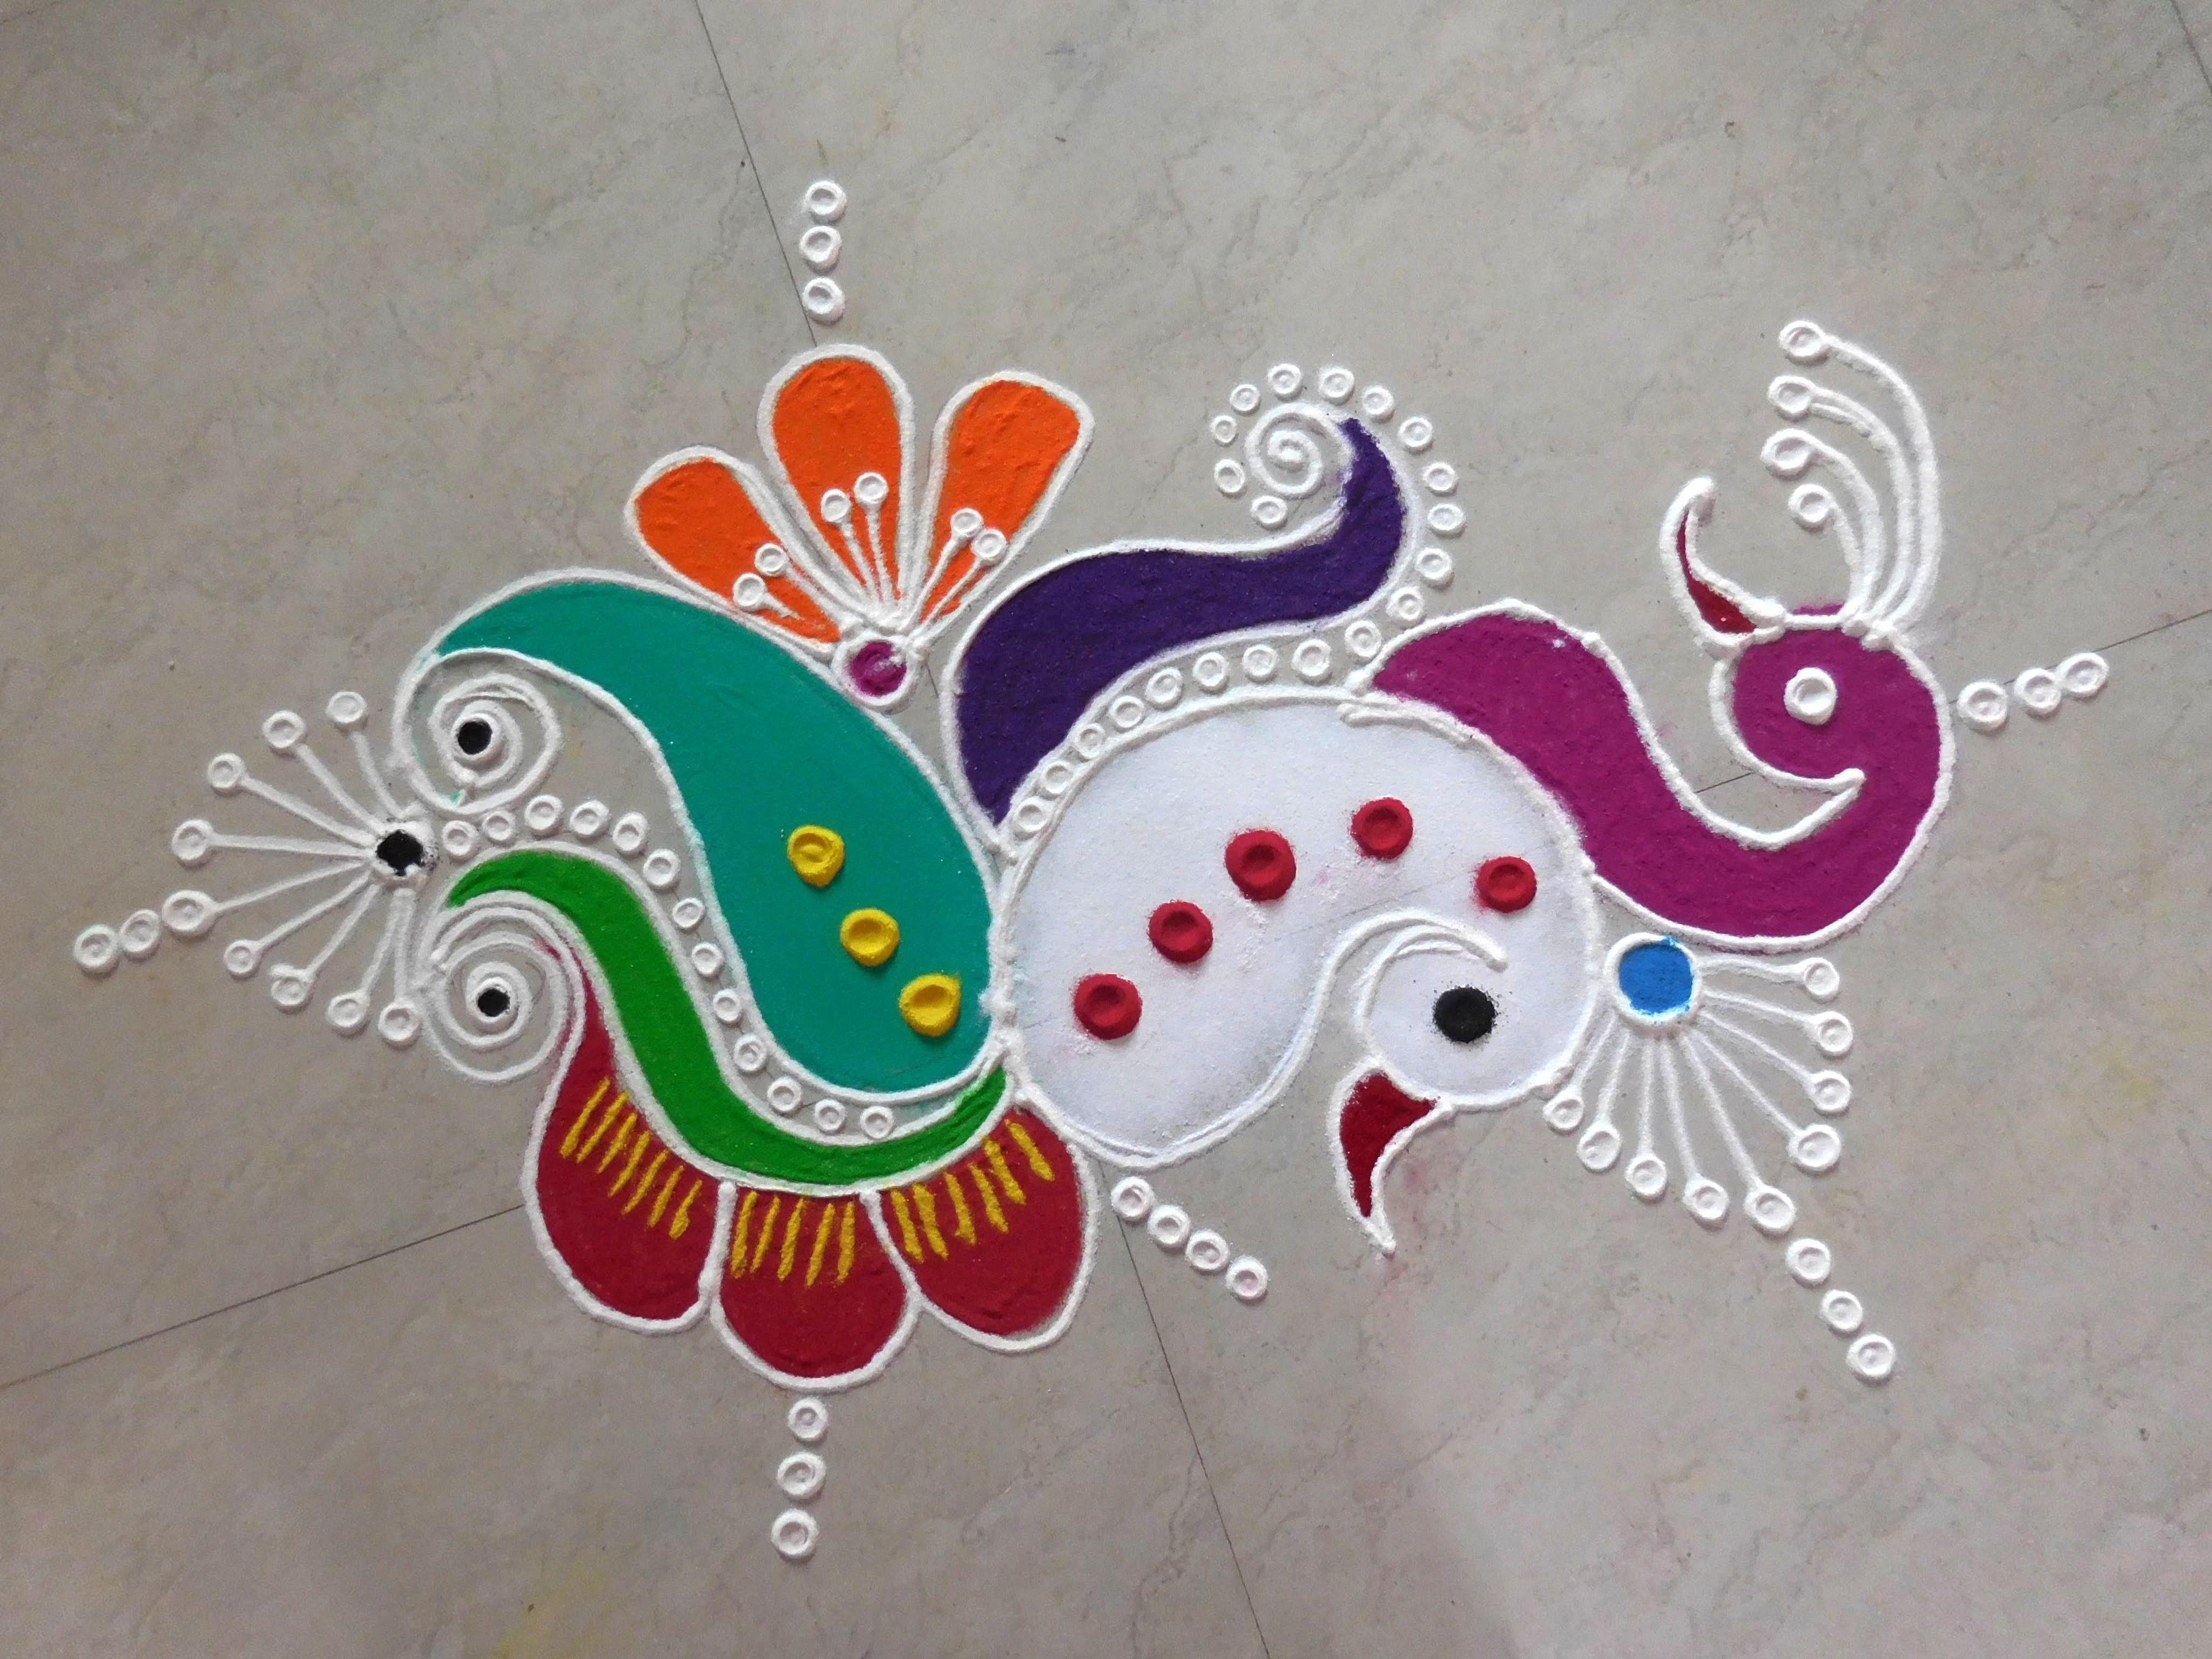 Peacock Rangoli Design for Diwali with Modern Theme